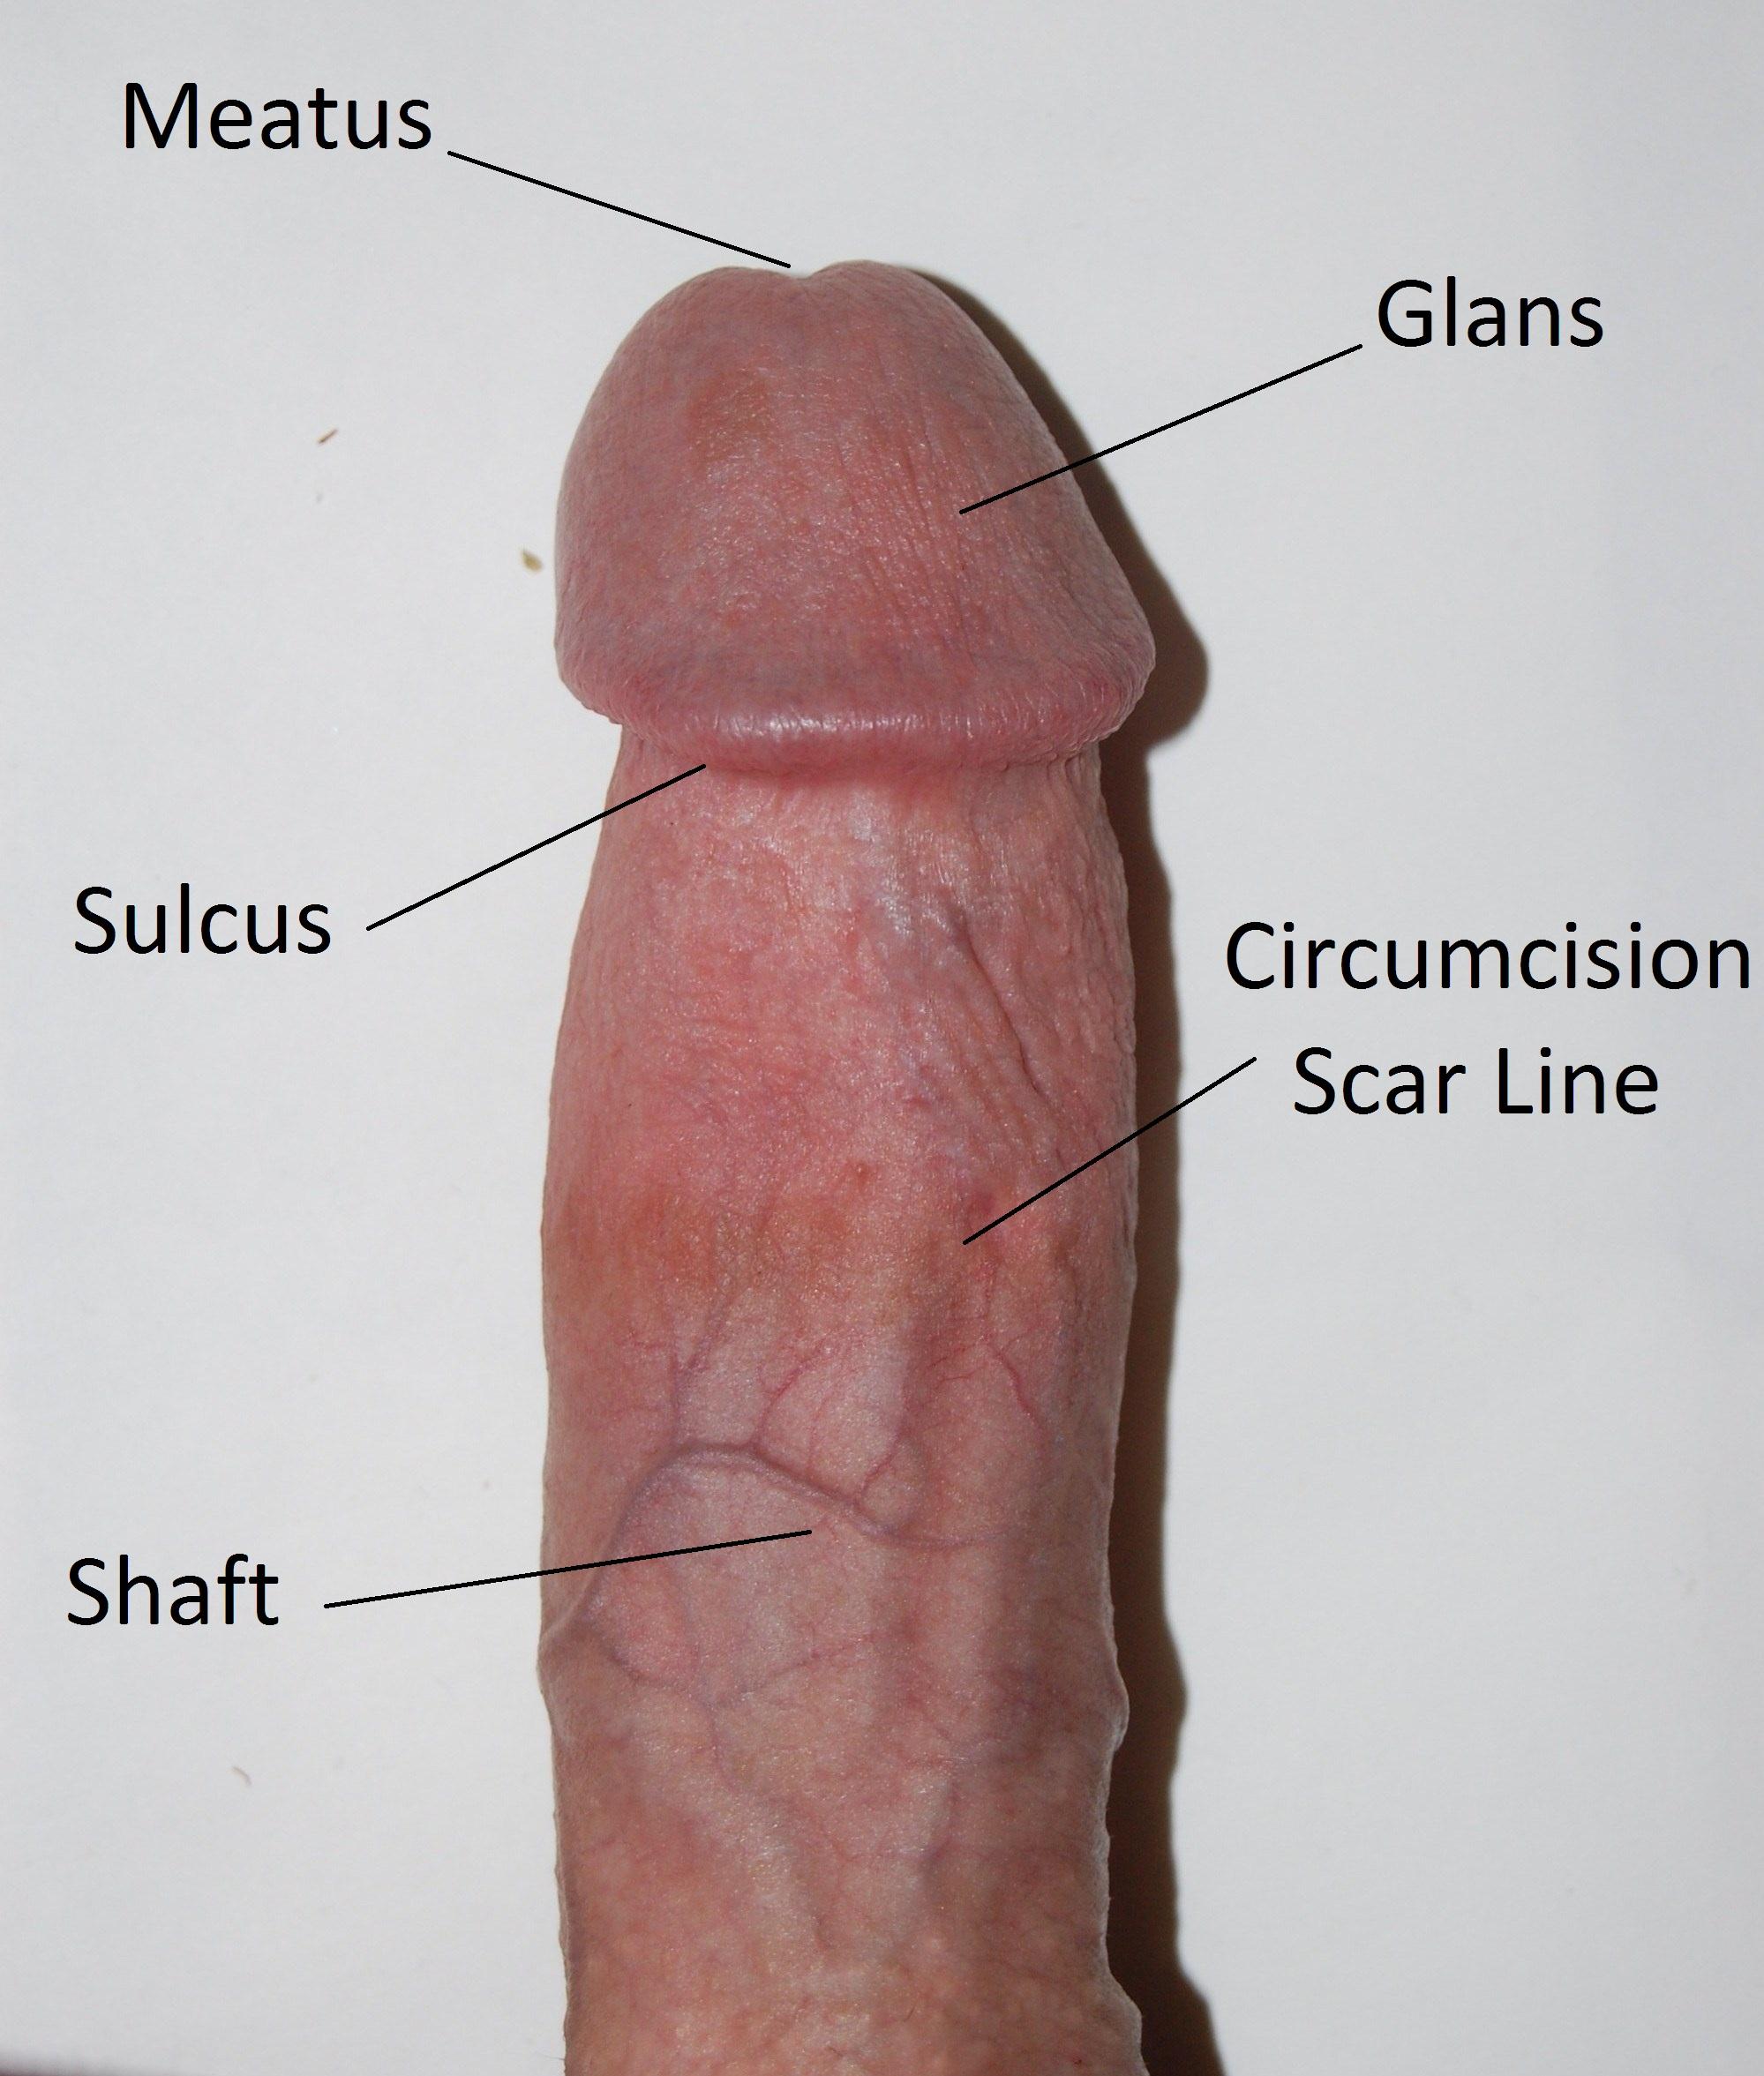 White Spots On Foreskin